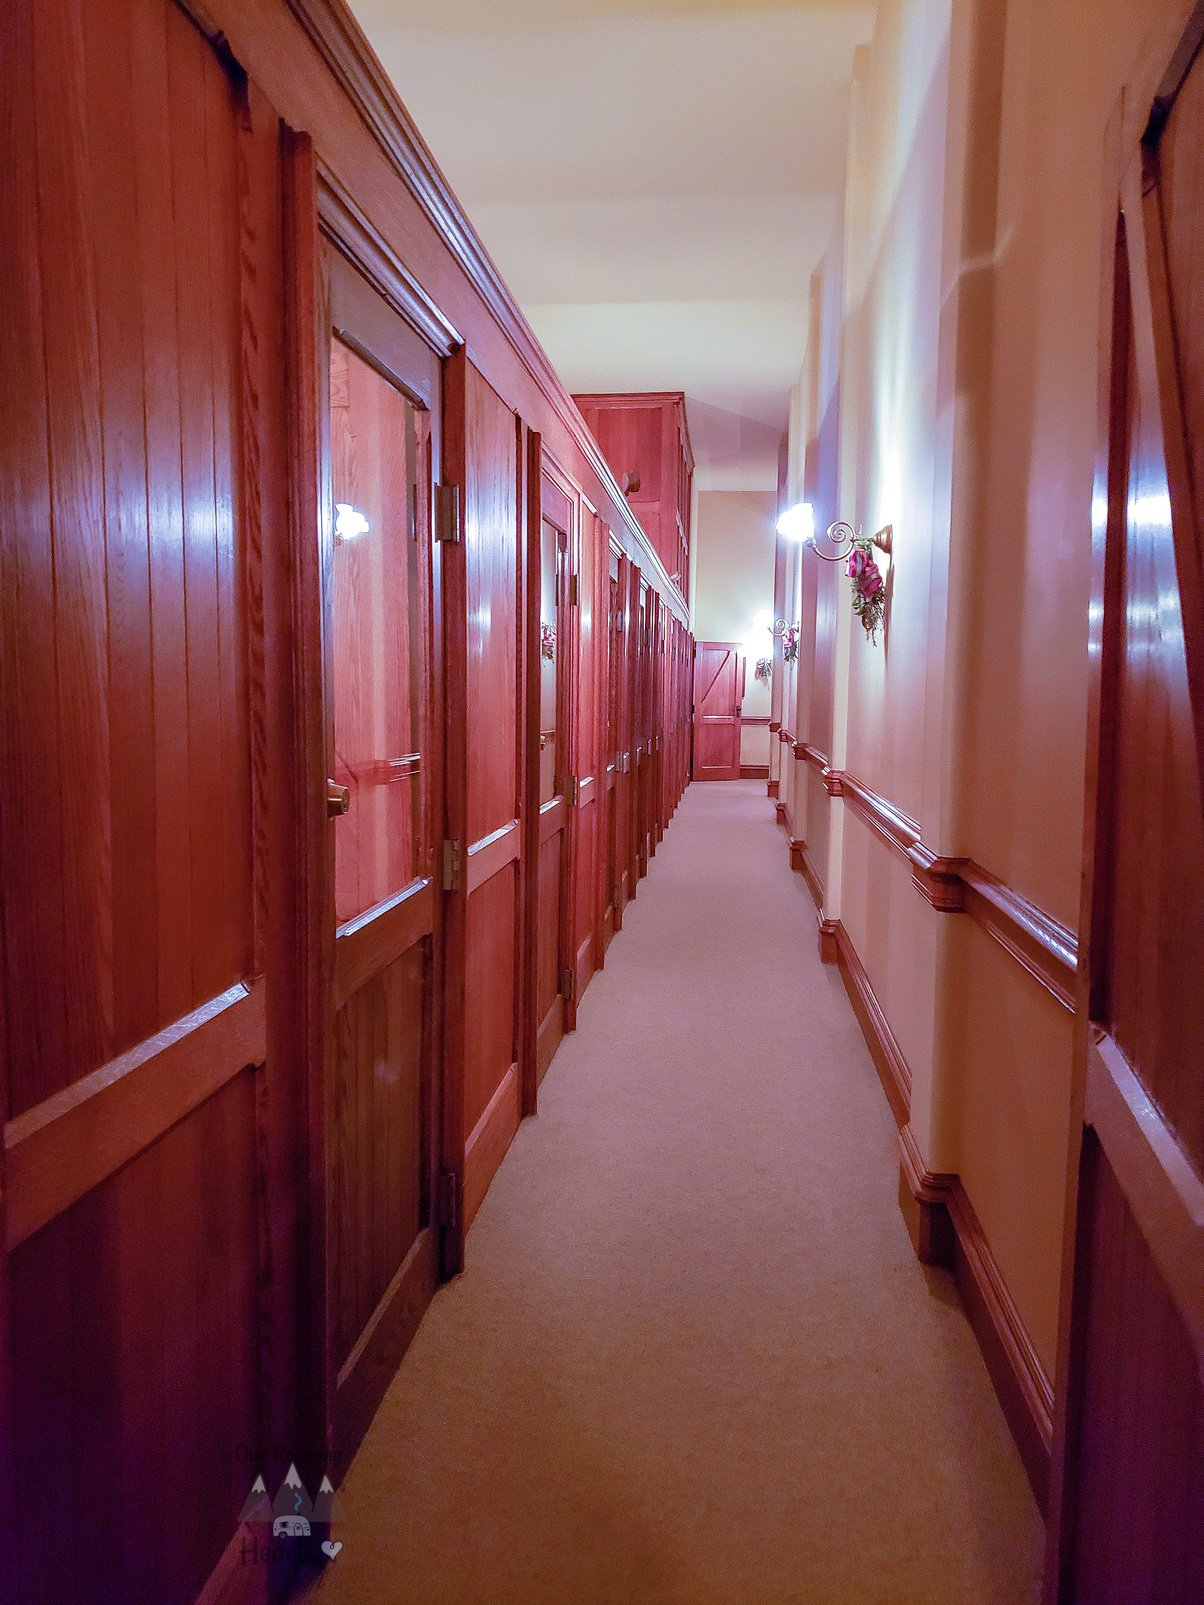 Biltmore House Tour + Biltmore Estate Dressing Room